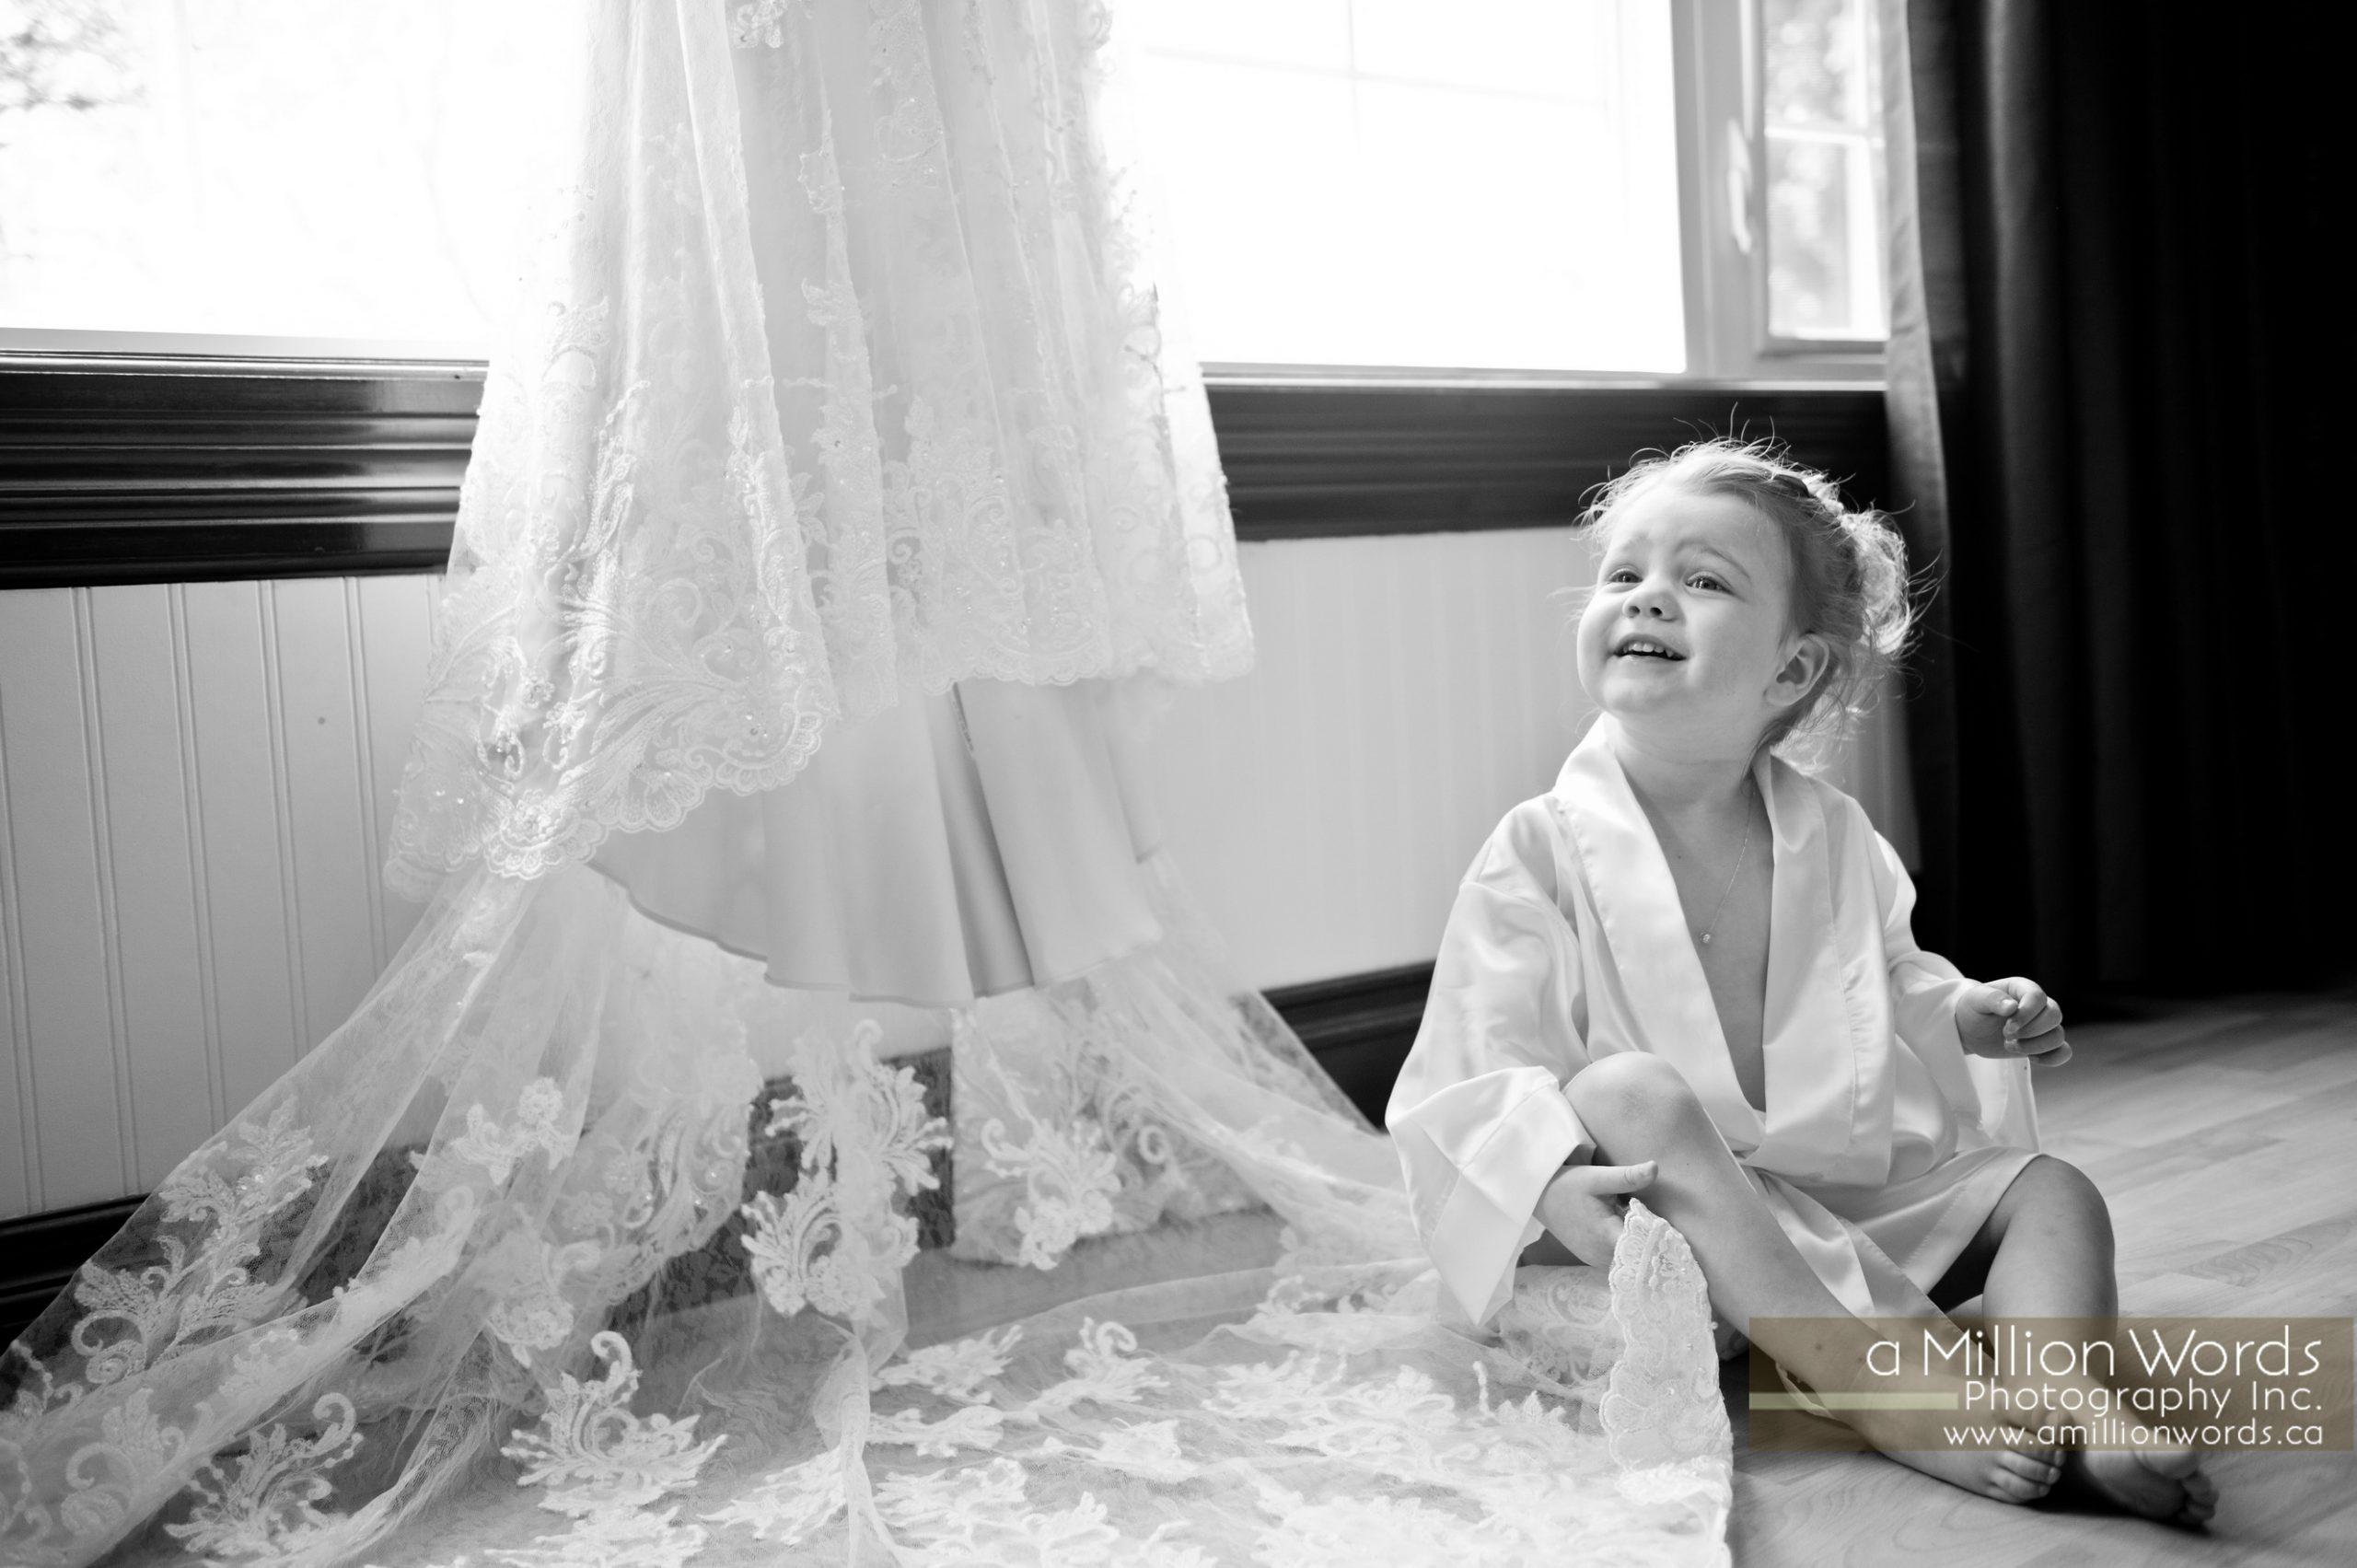 arthur_wedding_photographer15